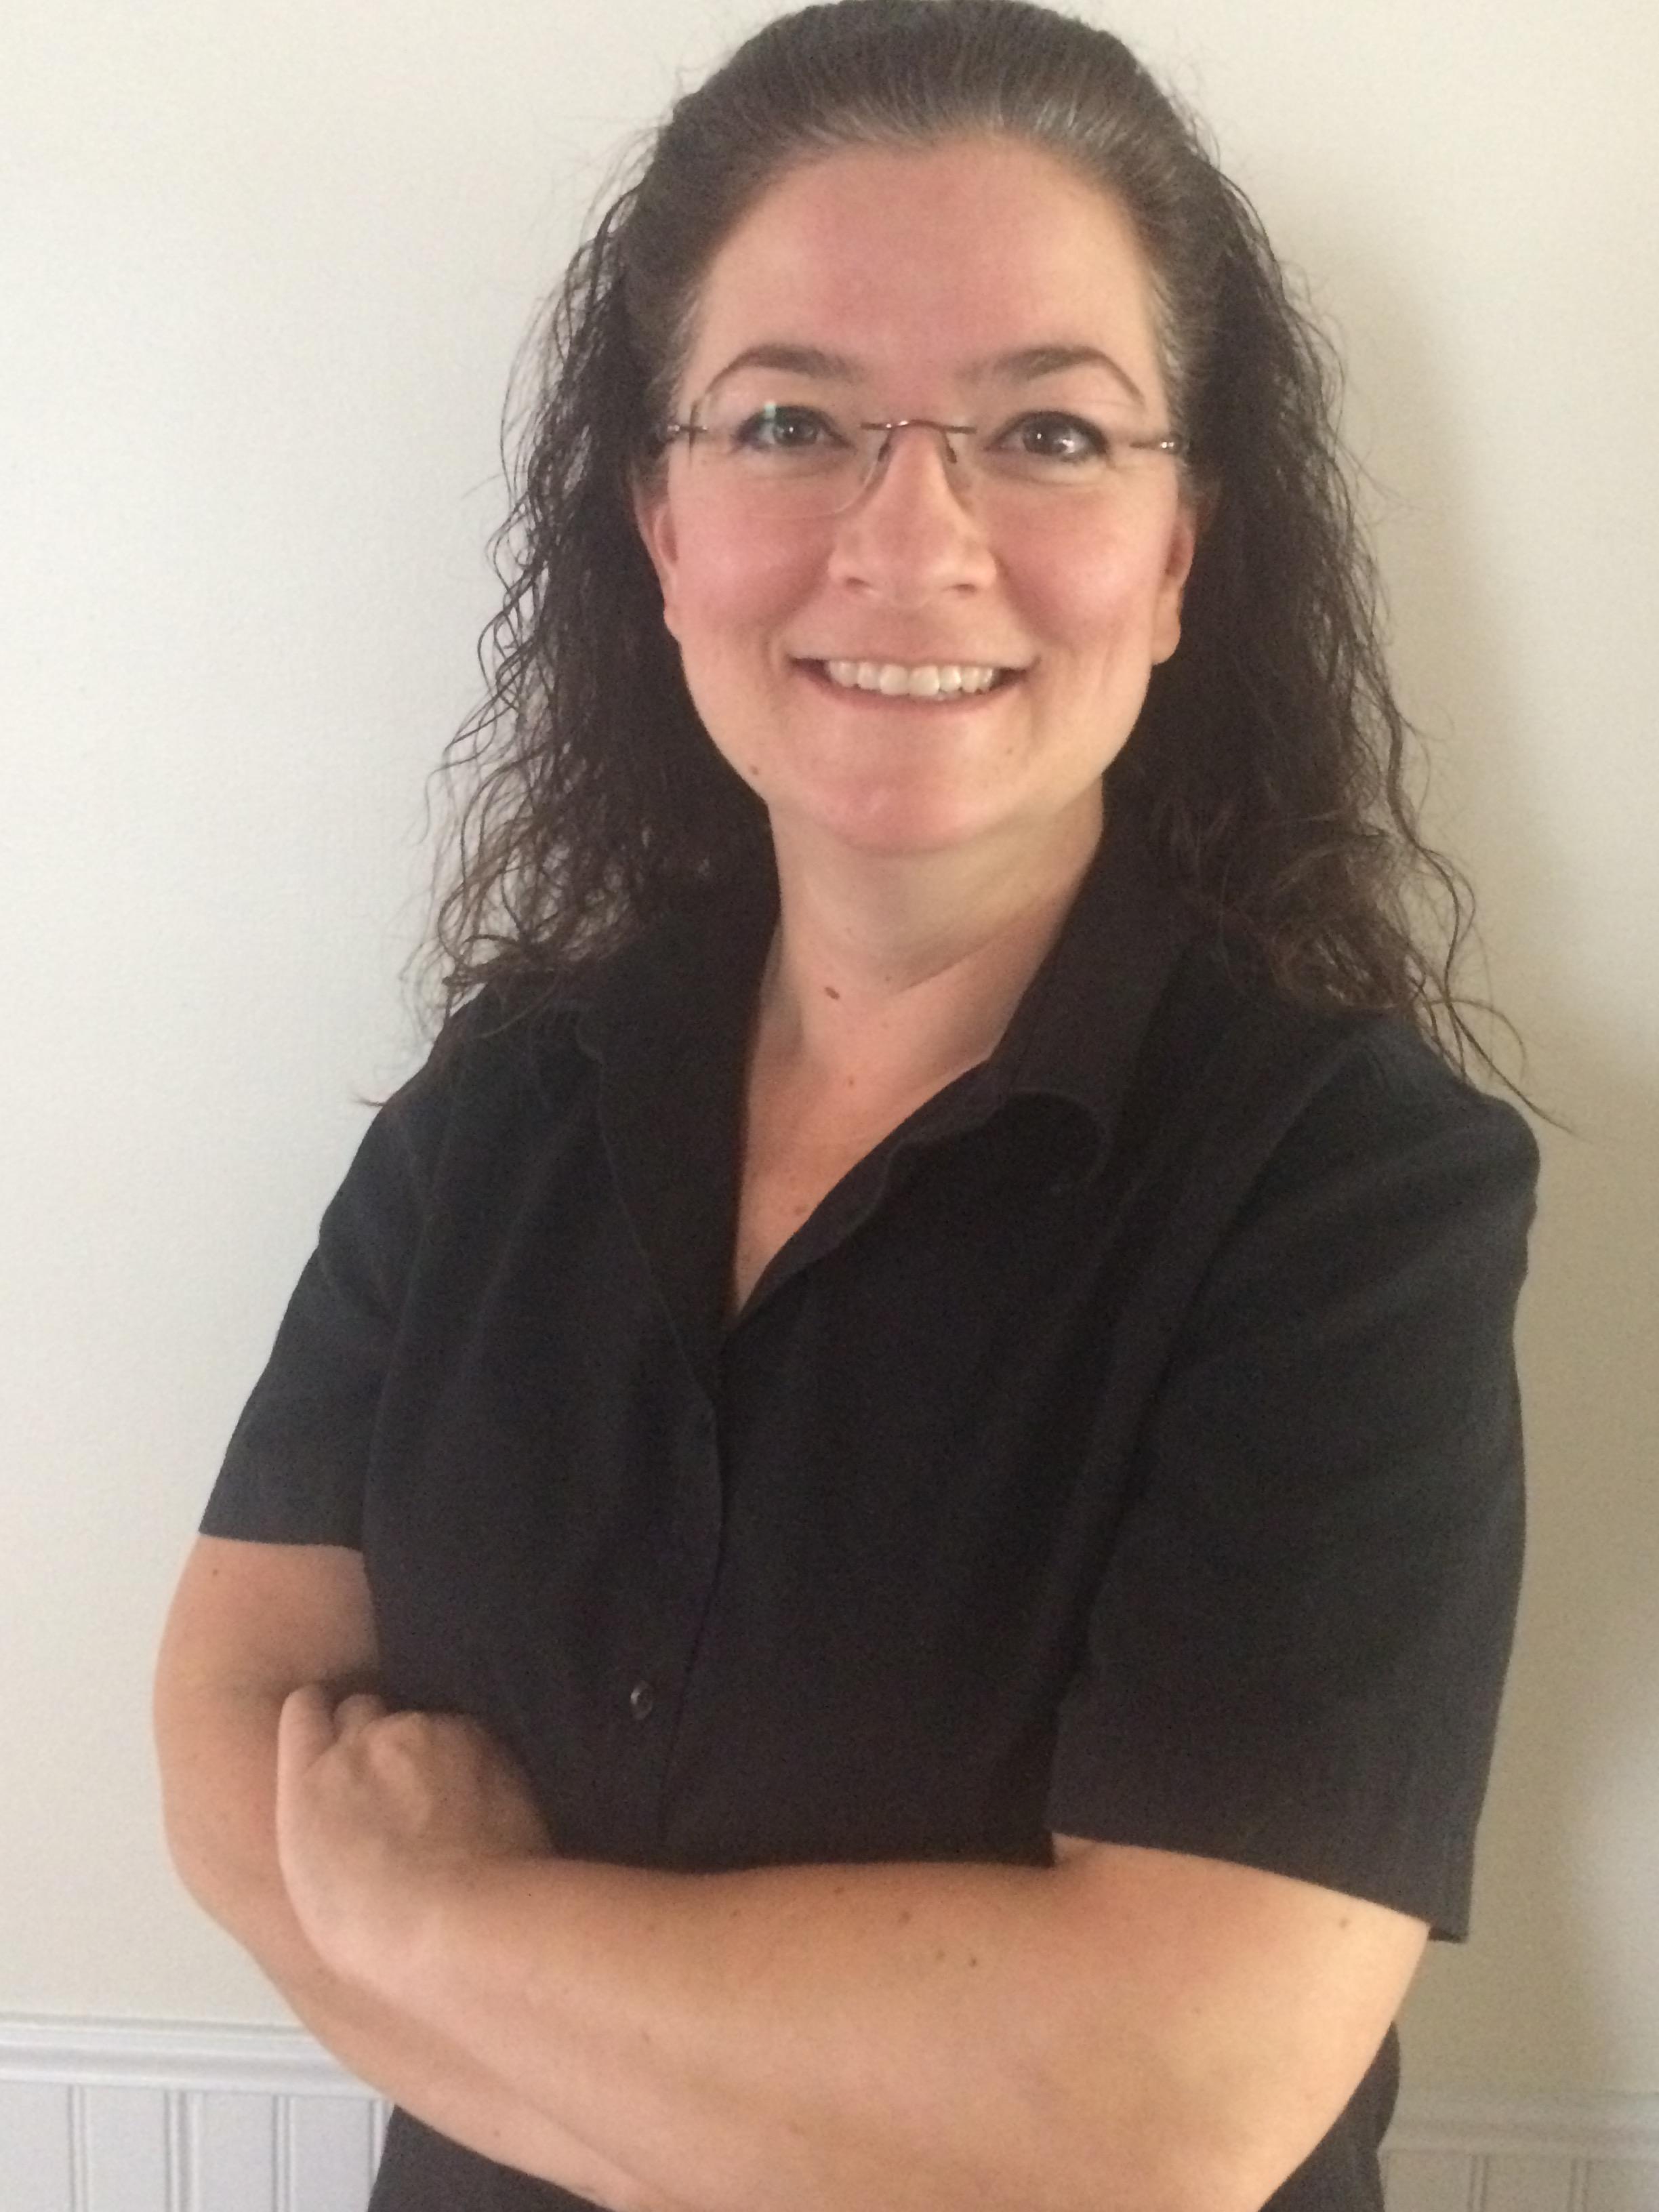 Tanya Langis - Food Service Director